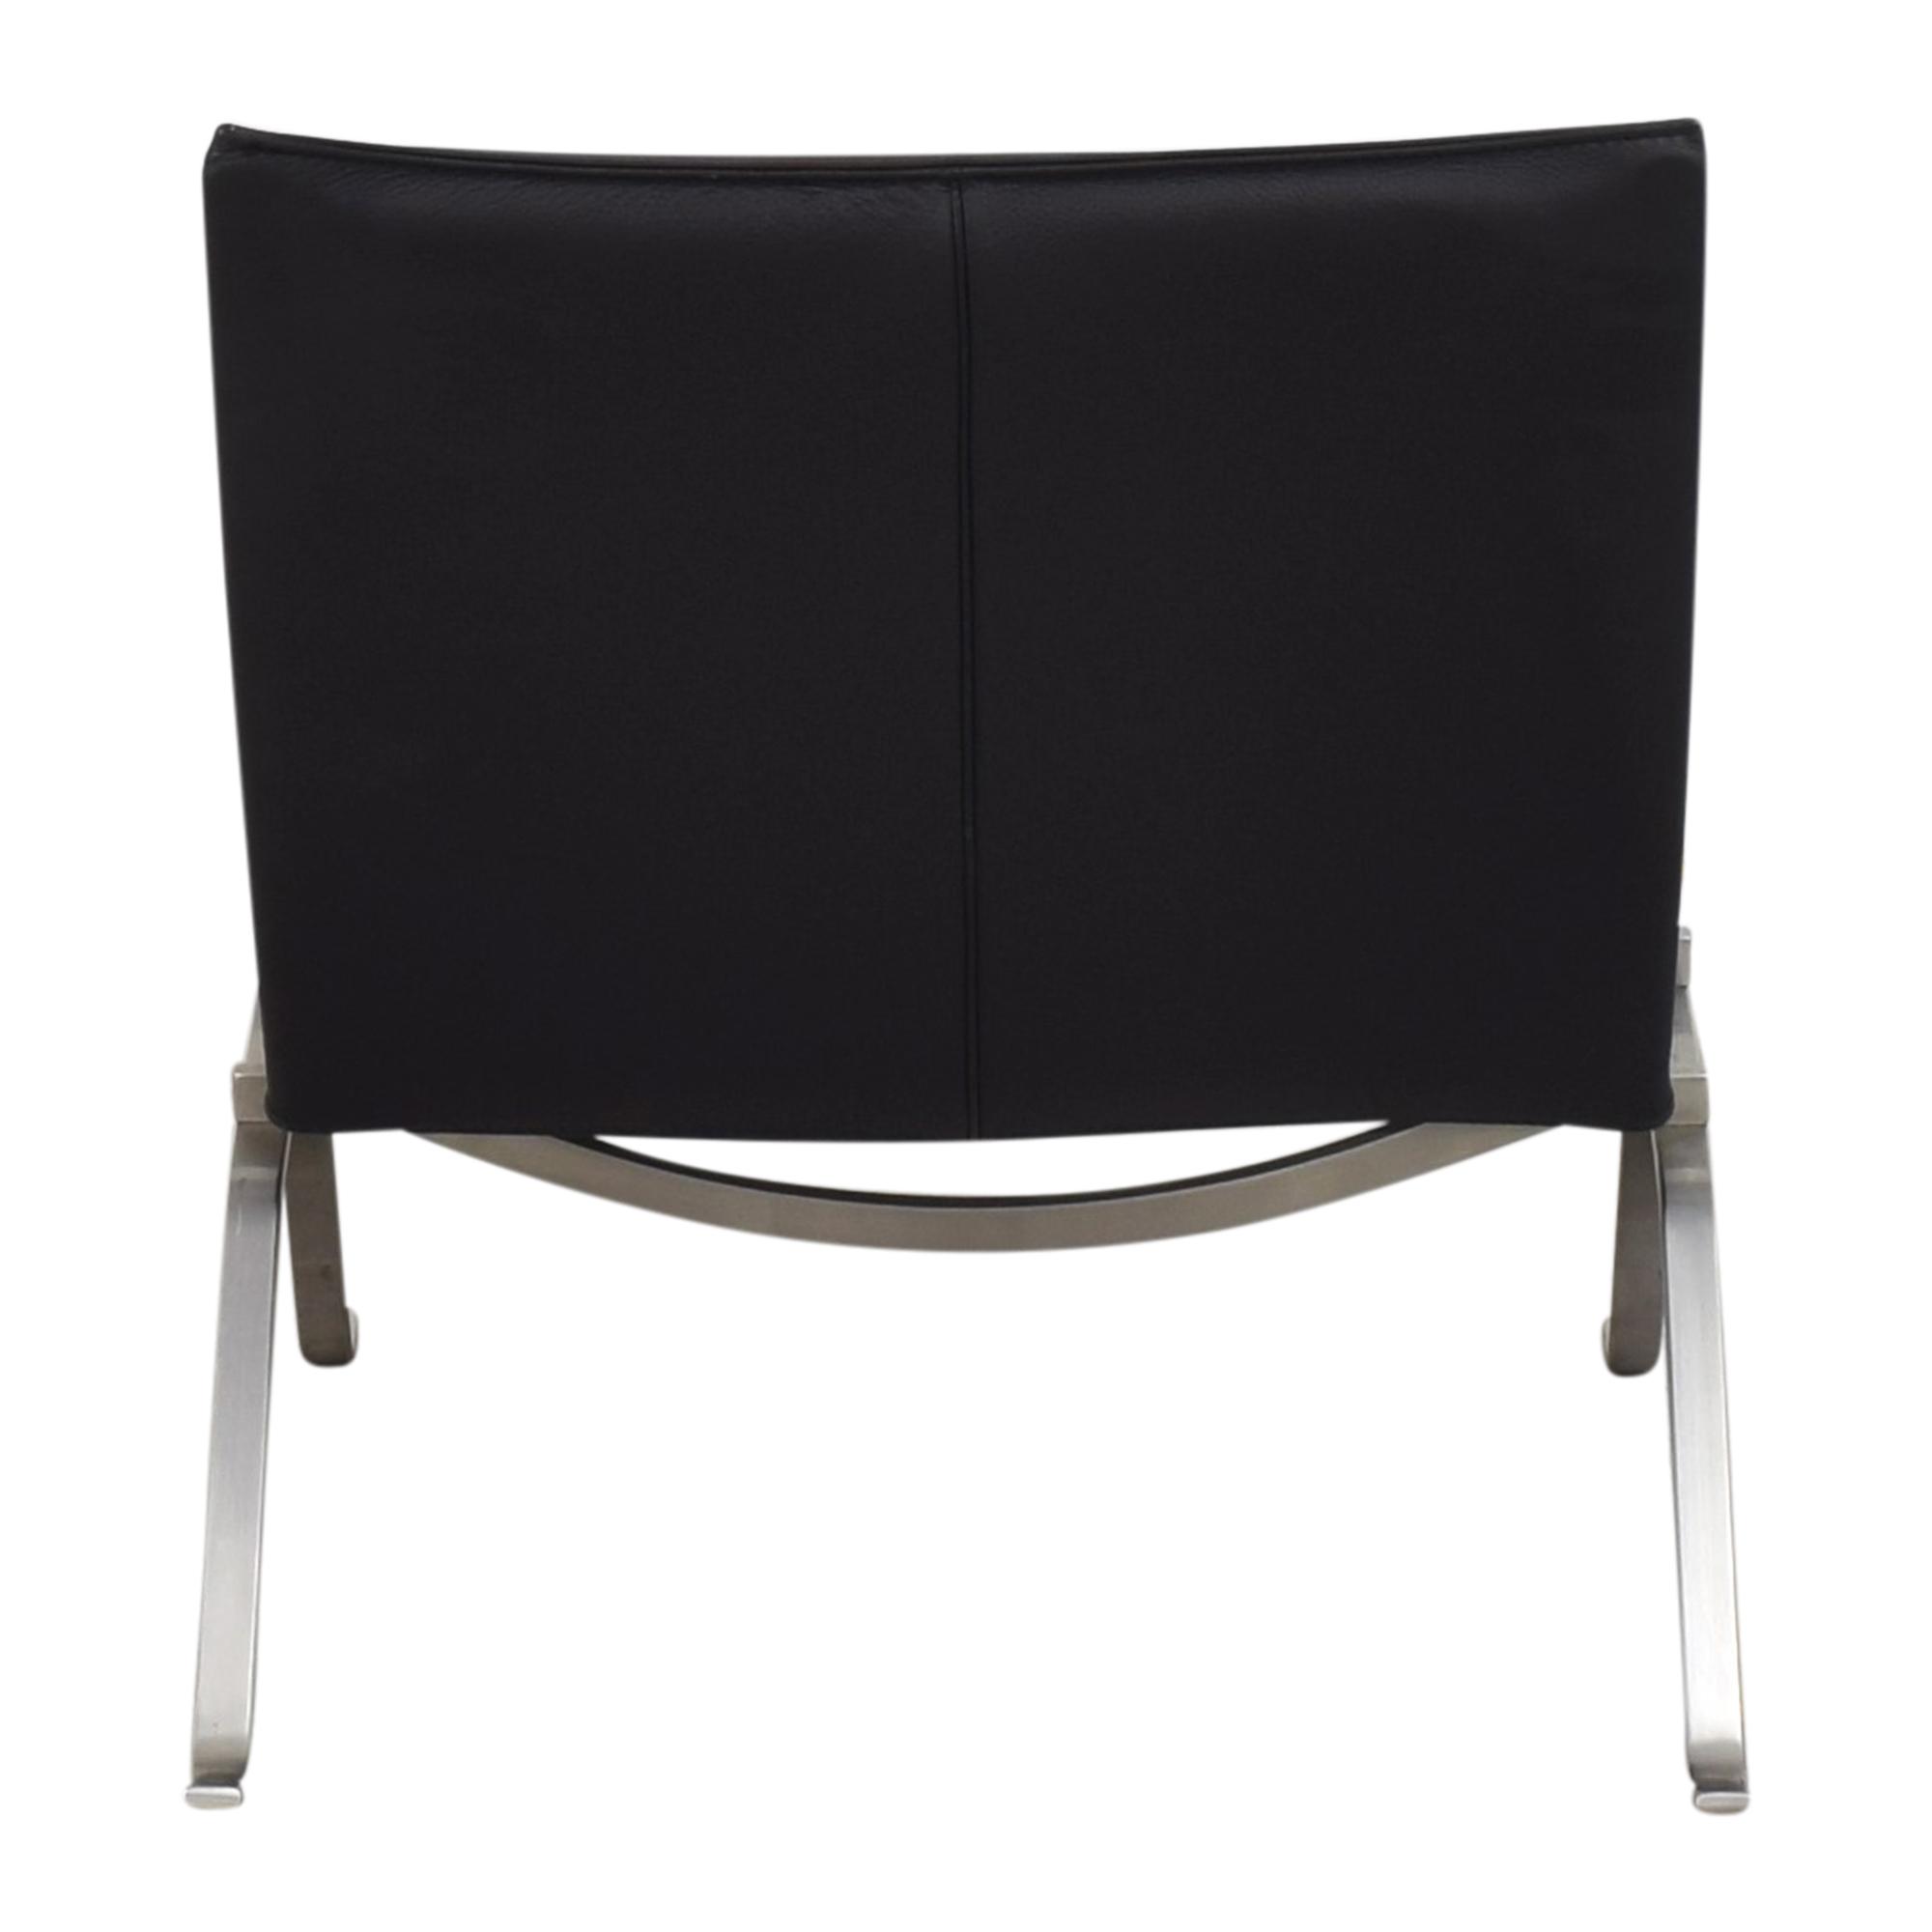 Fritz Hansen Fritz Hansen Poul Kjaerholm PK22 Modern Chair for sale